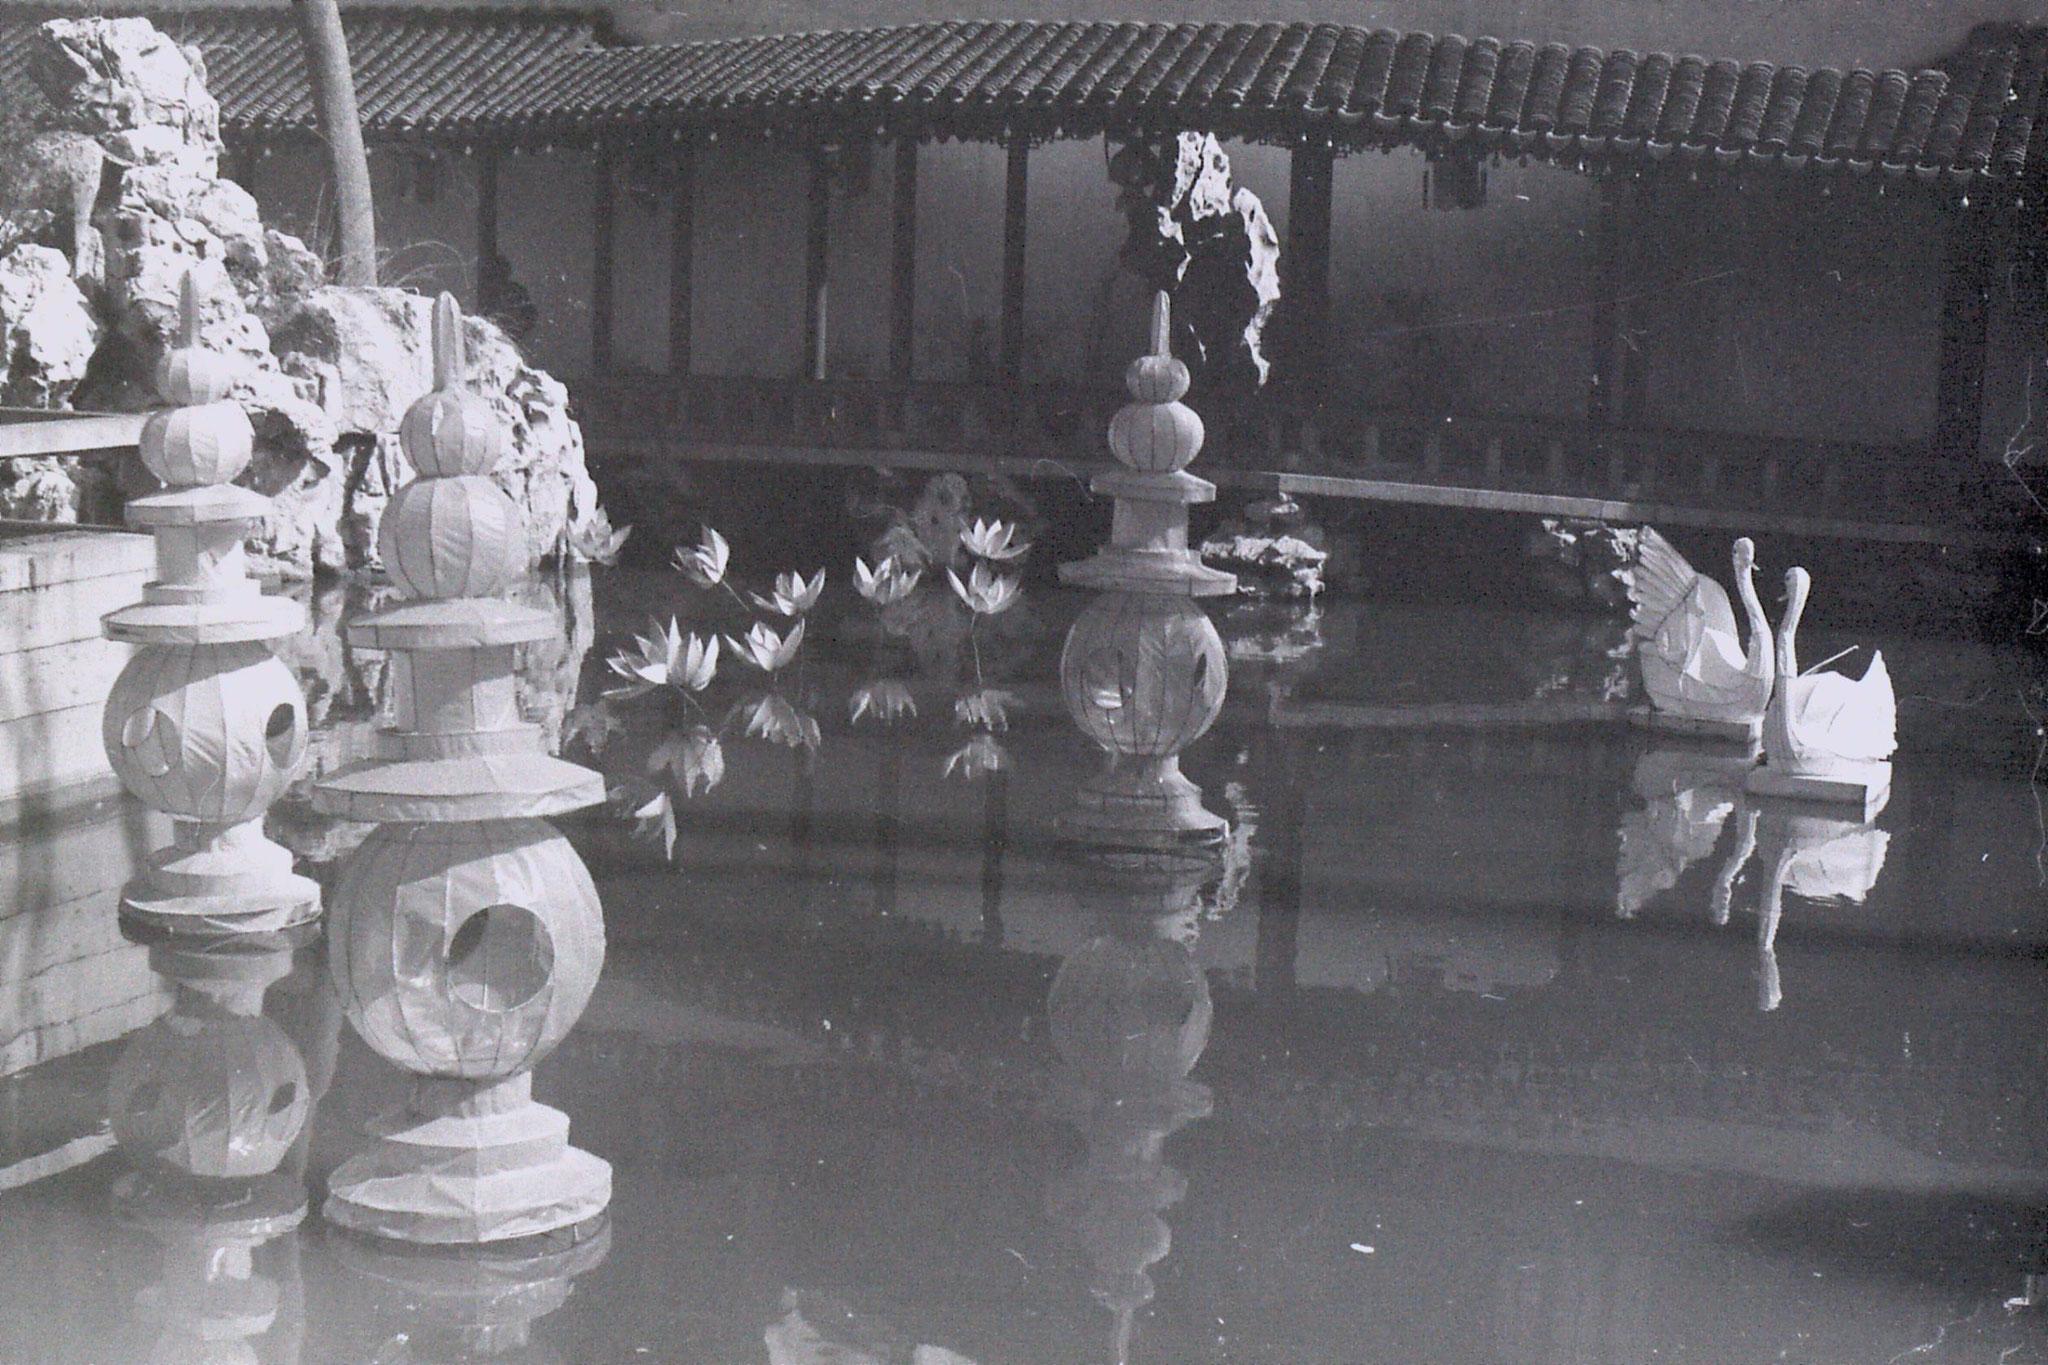 10/2/1989: 5: Shanghai Yuyuan Gardens